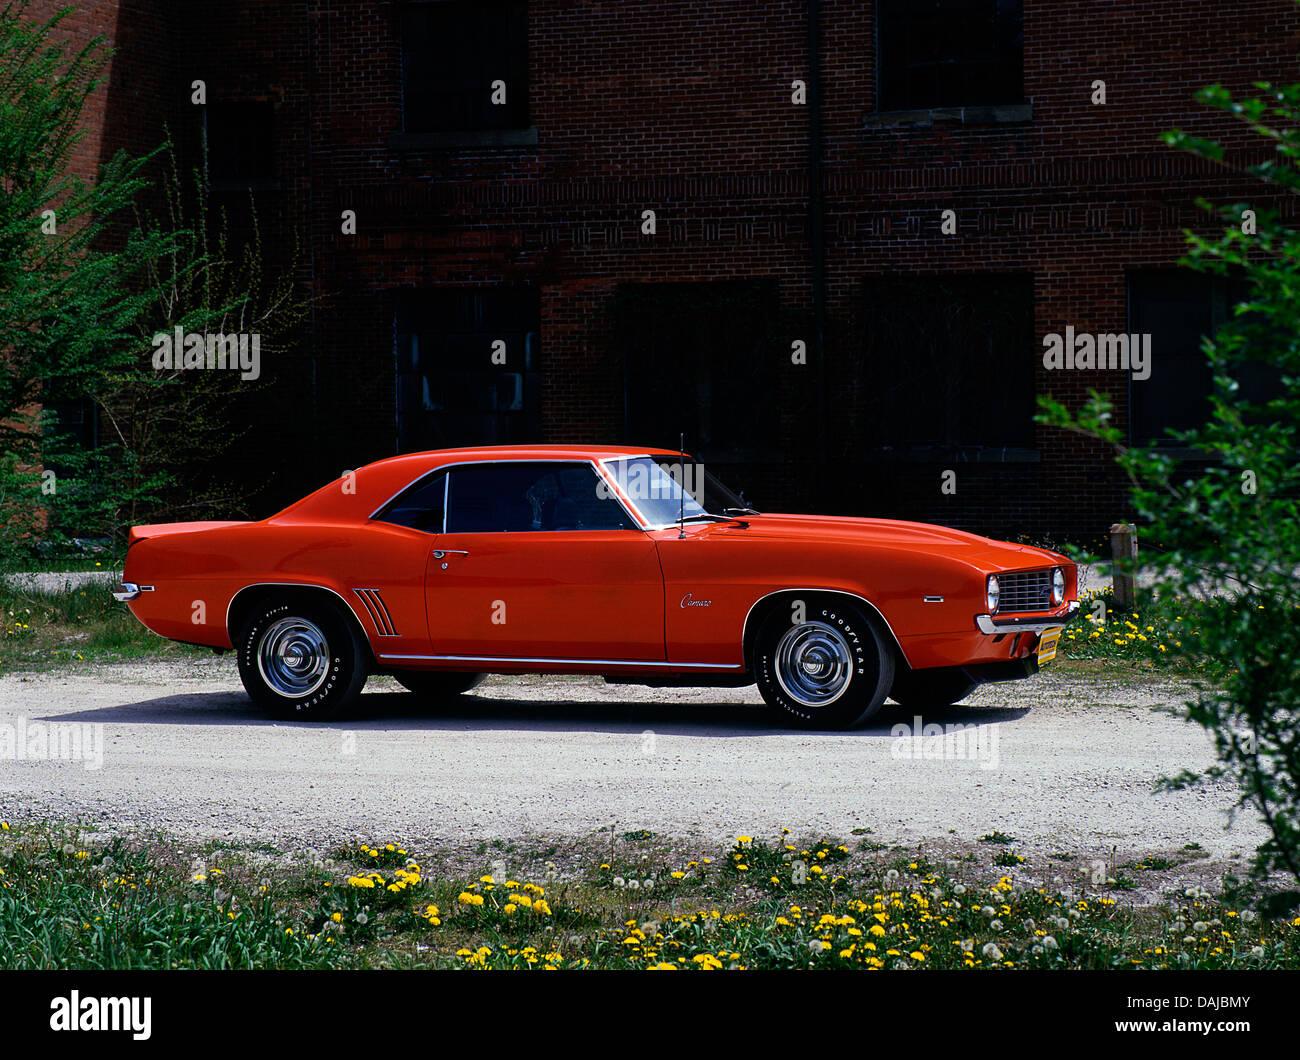 1969 Chevrolet Camaro Copo - Stock Image